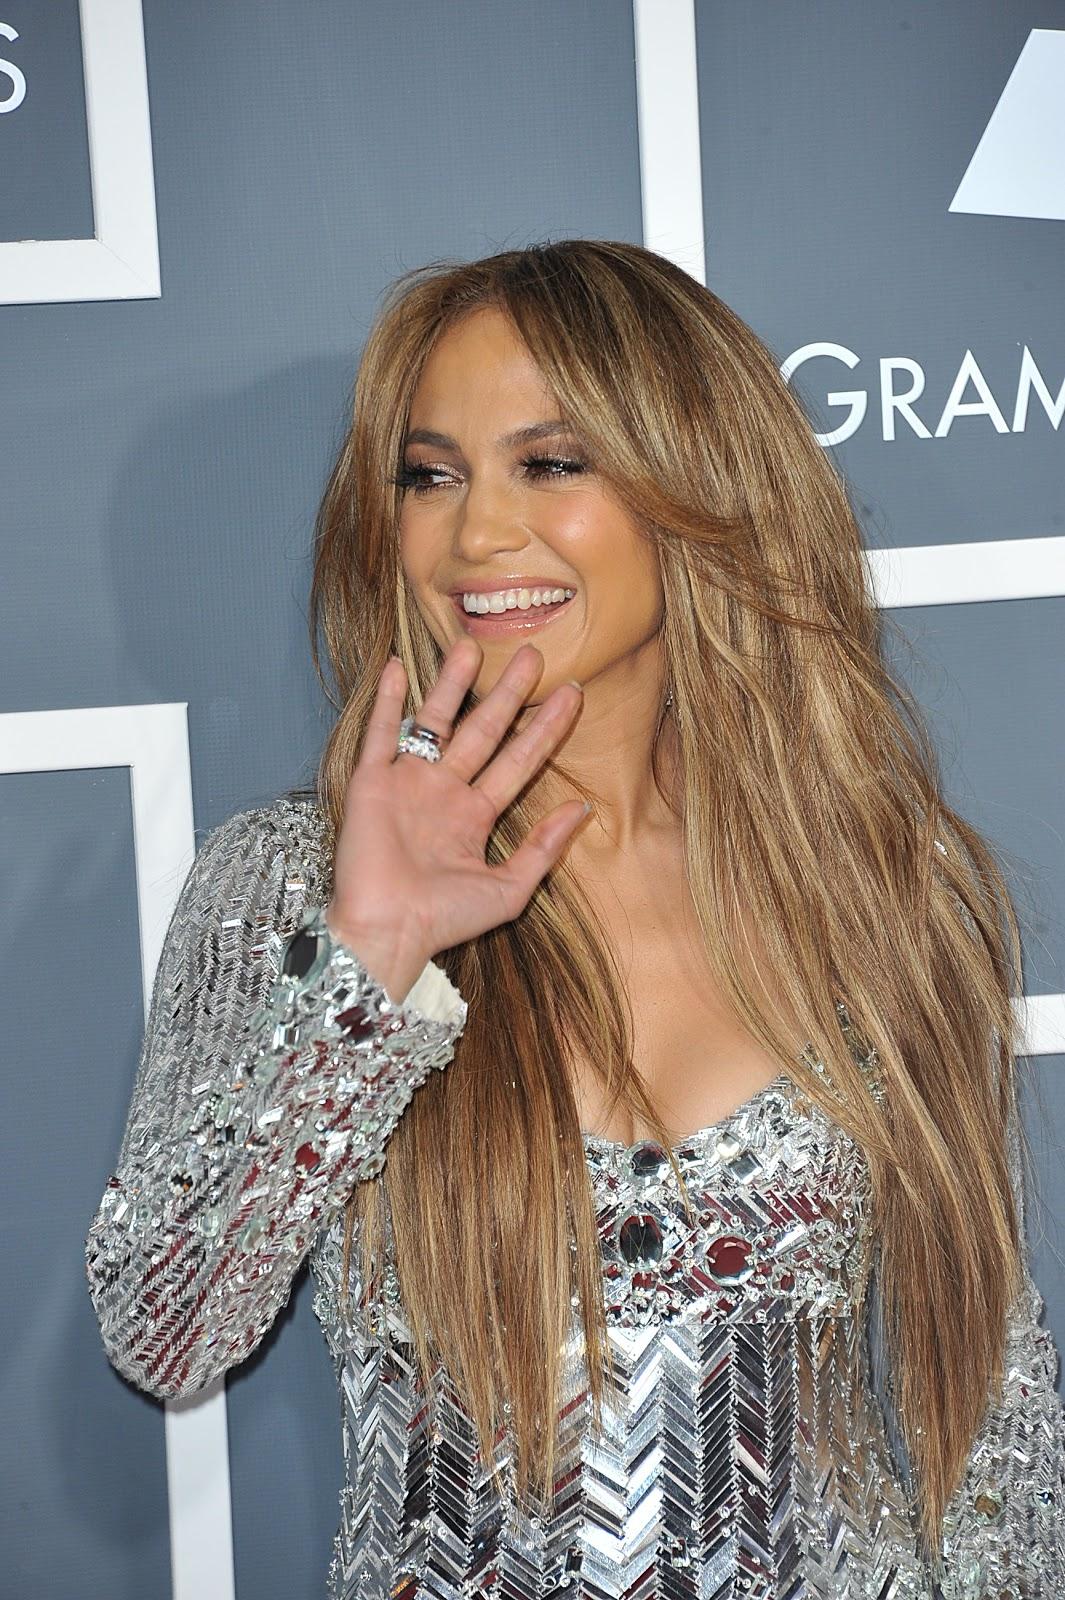 http://3.bp.blogspot.com/-yBO2xkNpEho/TwO1_GSXQMI/AAAAAAAAEhE/PVhwH65geIU/s1600/Jennifer-Lopez-53rd-Annual-Grammy-Awards-2-13-11-2.jpg